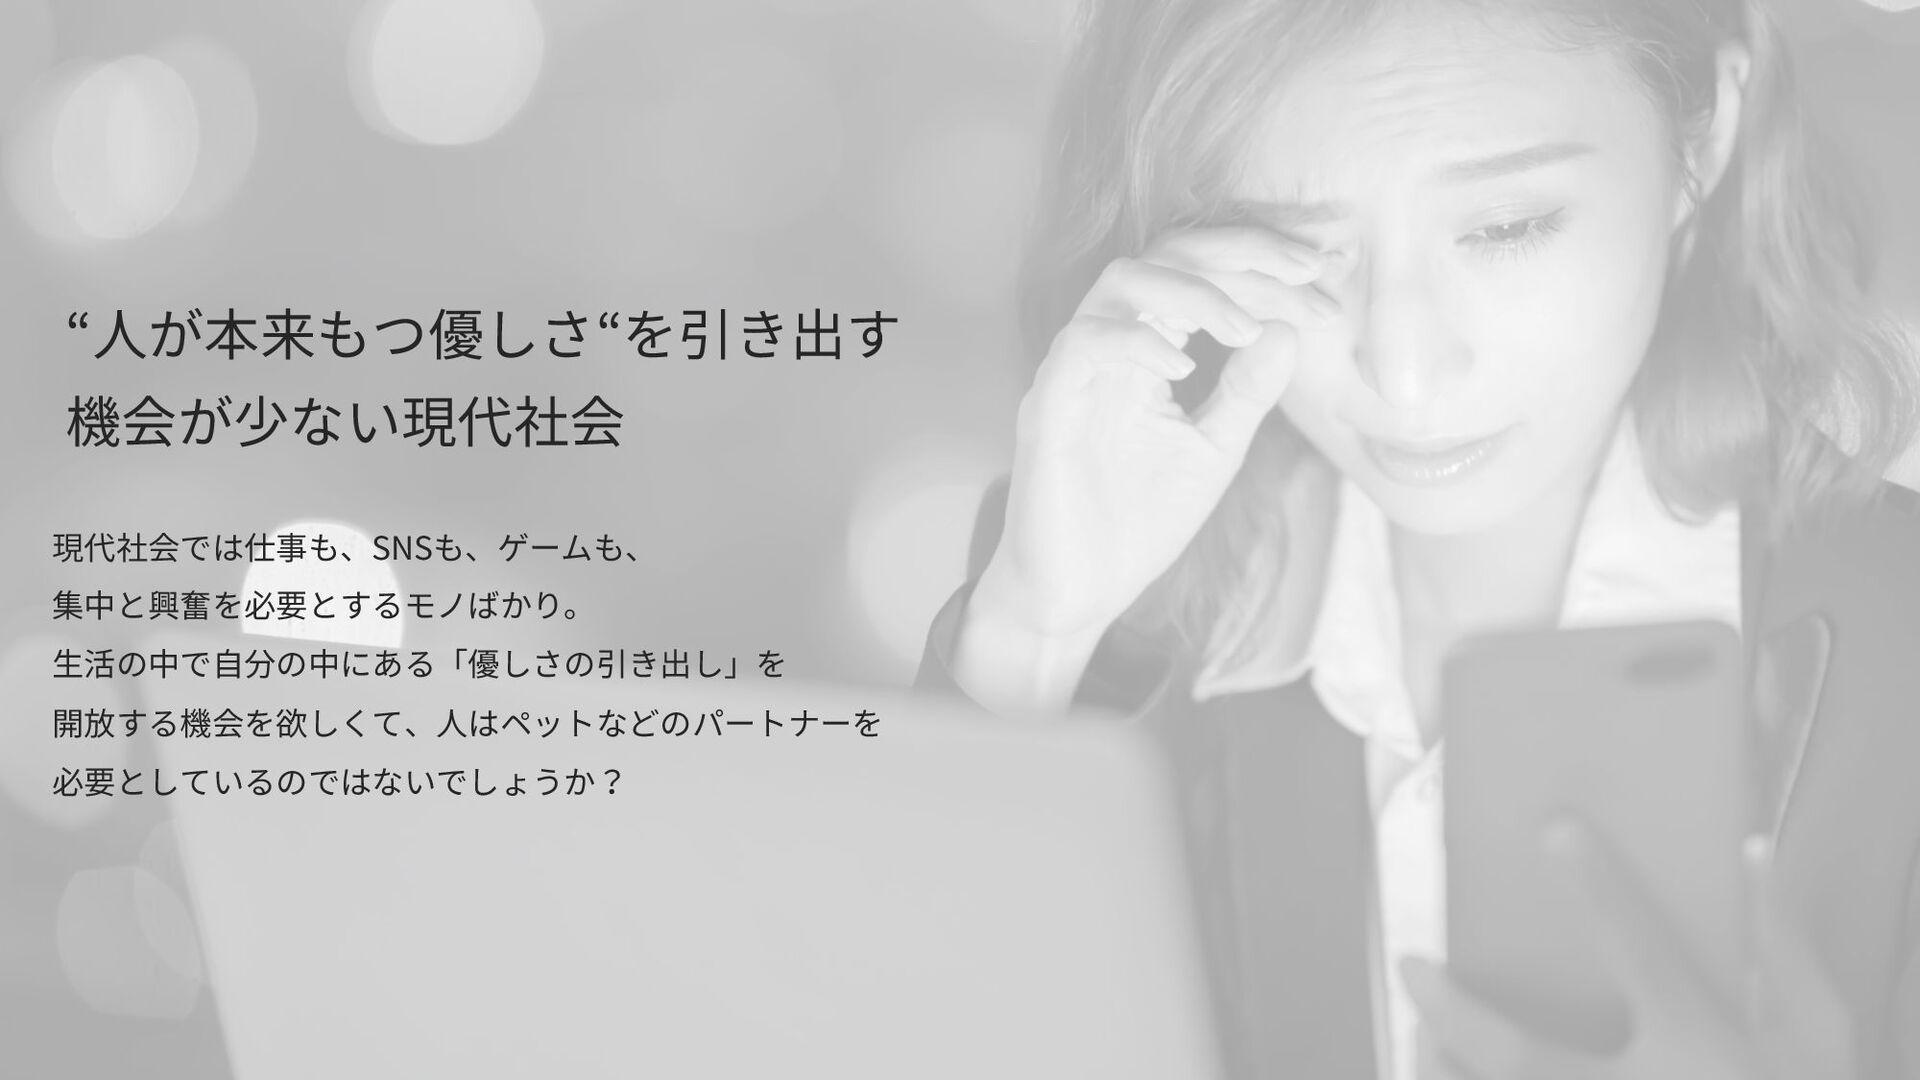 R O B O T 人の代わりに何かの作業を 自律的に行う装置、 もしくは機械のこと。 (Wi...